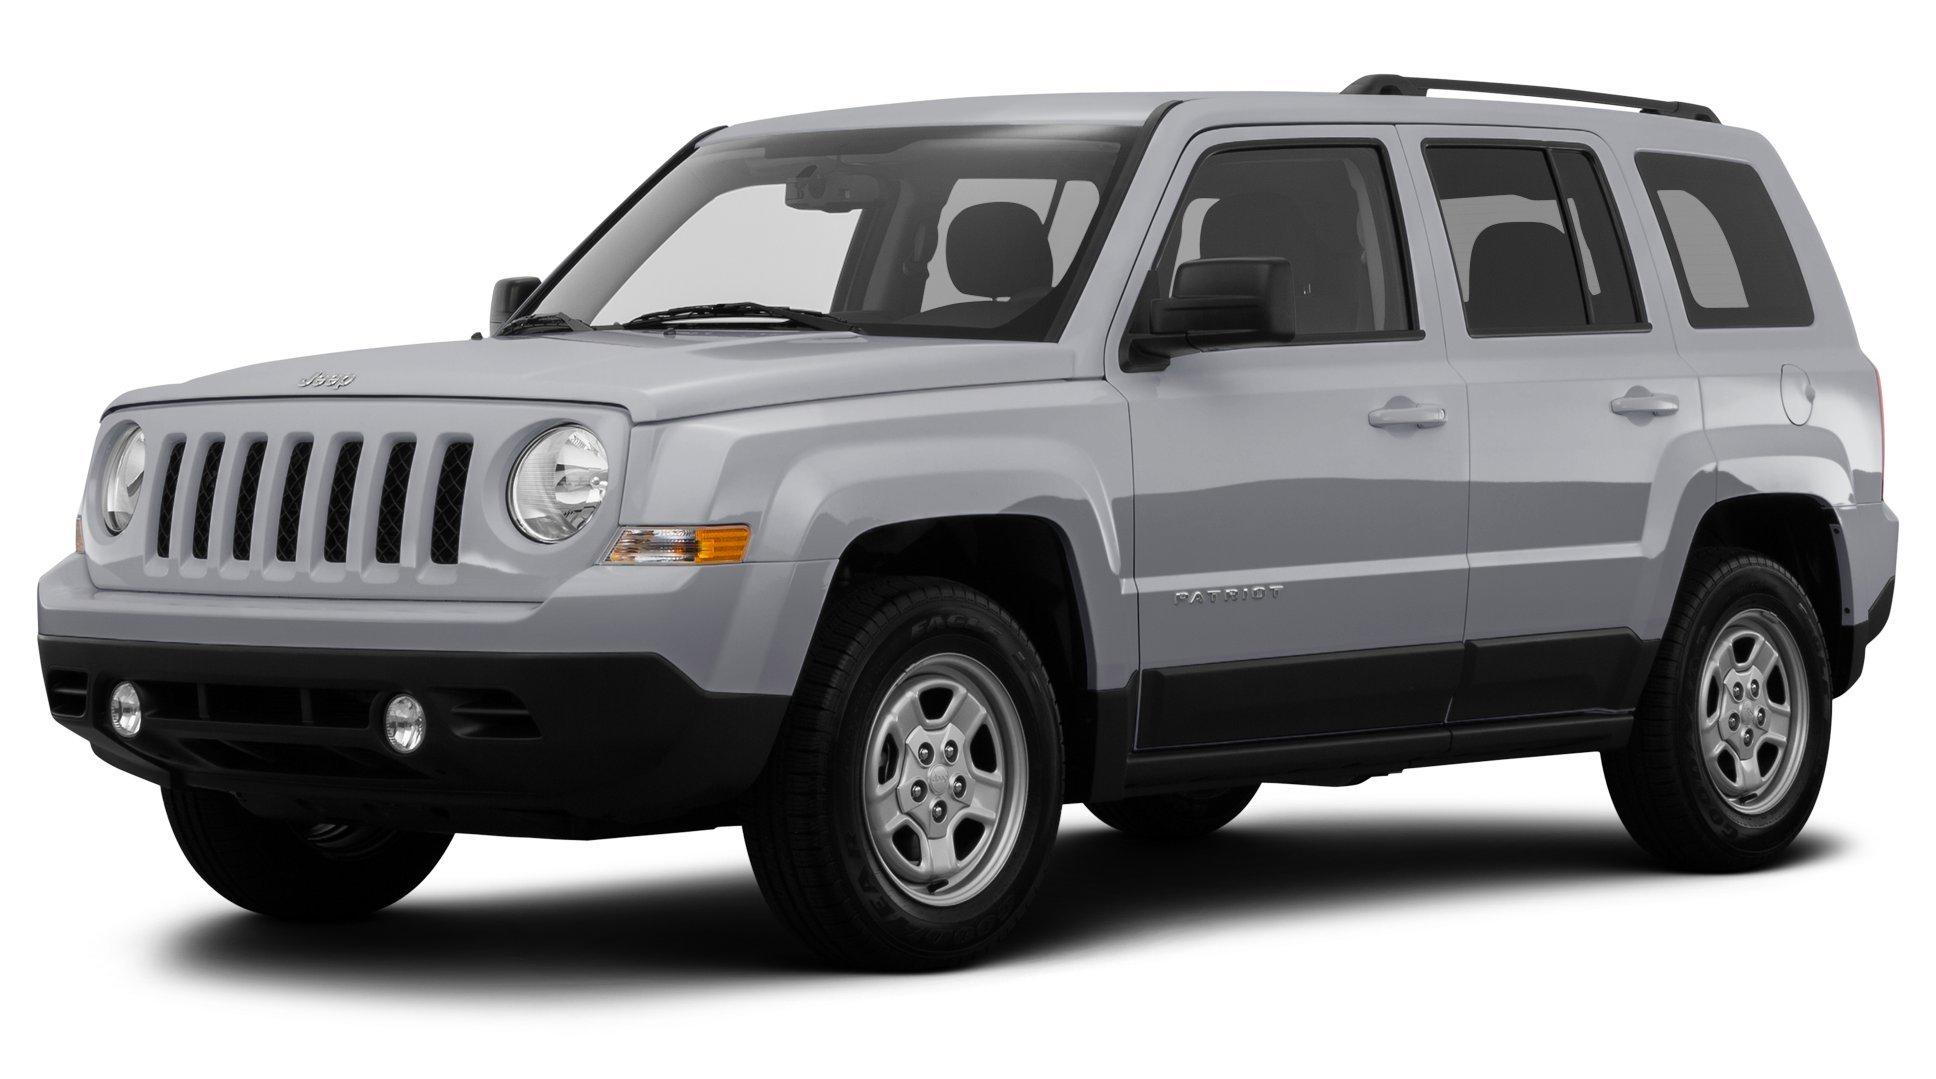 Patriot Tires Jeep Suv Car Truck Minivan >> Amazon Com 2016 Jeep Patriot Reviews Images And Specs Vehicles